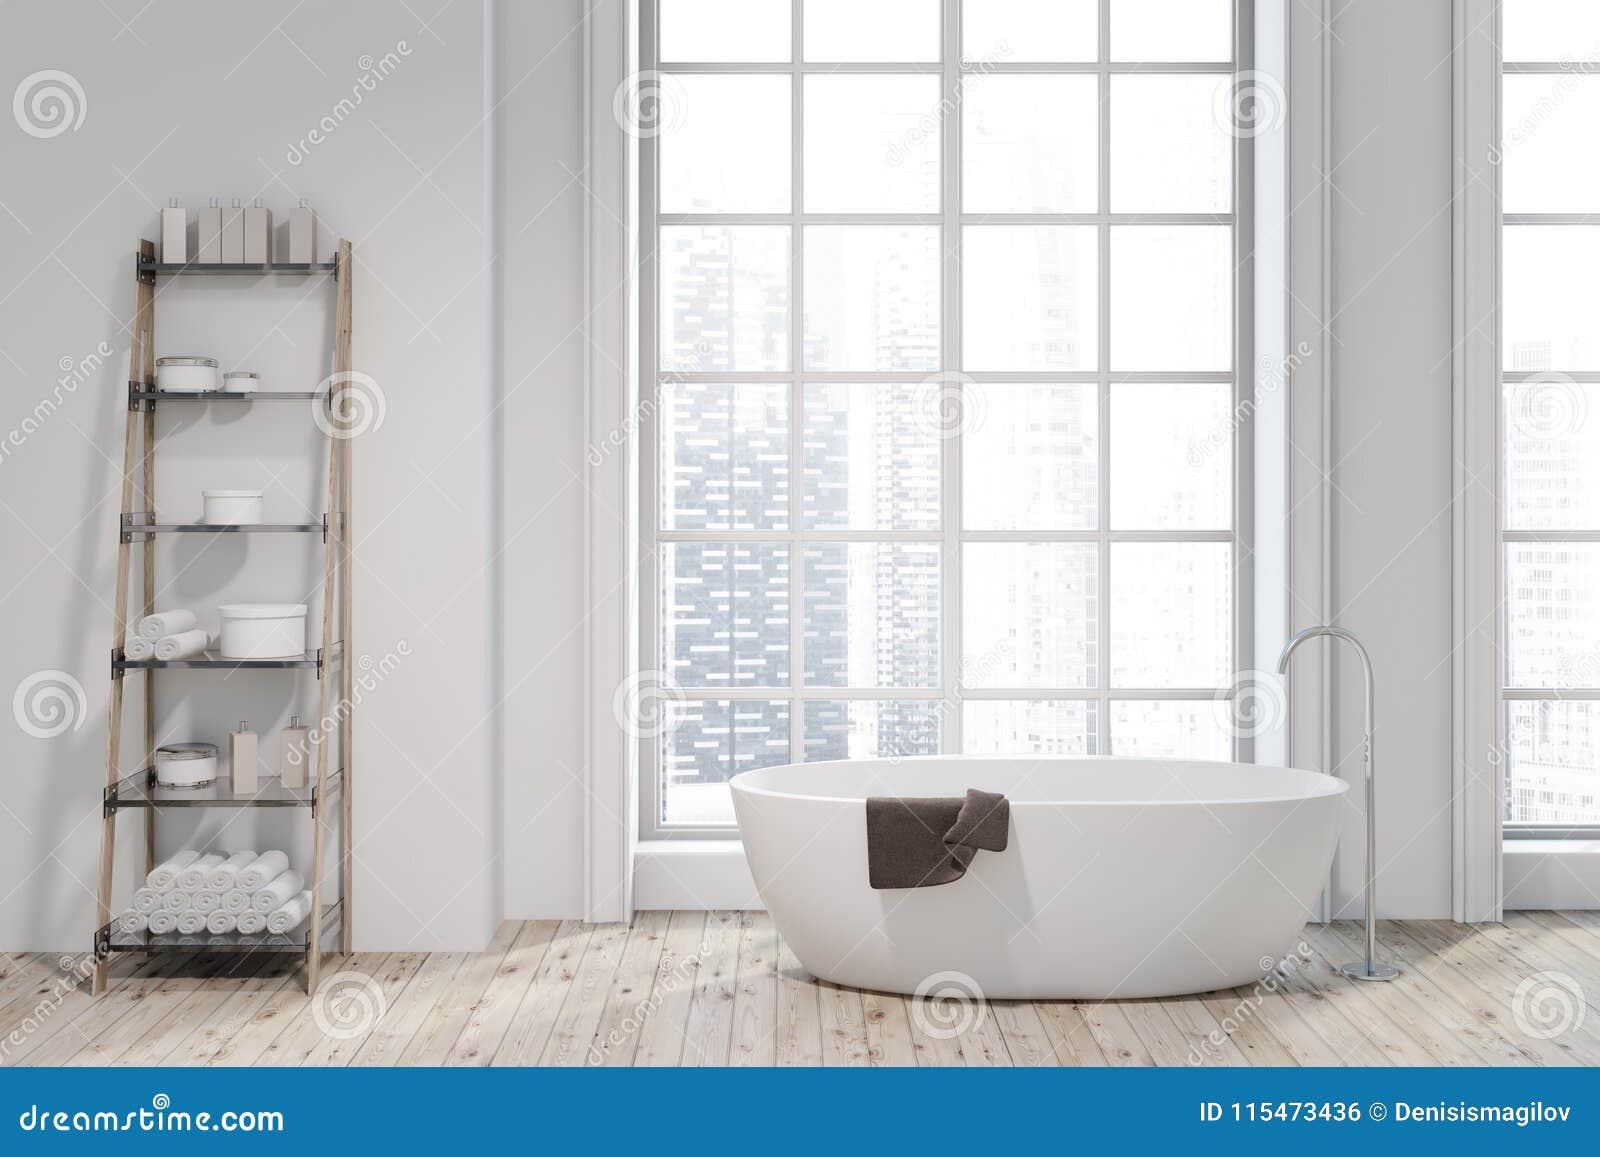 Loft Bathroom Interior, White Tub, Shelves Stock Illustration ...